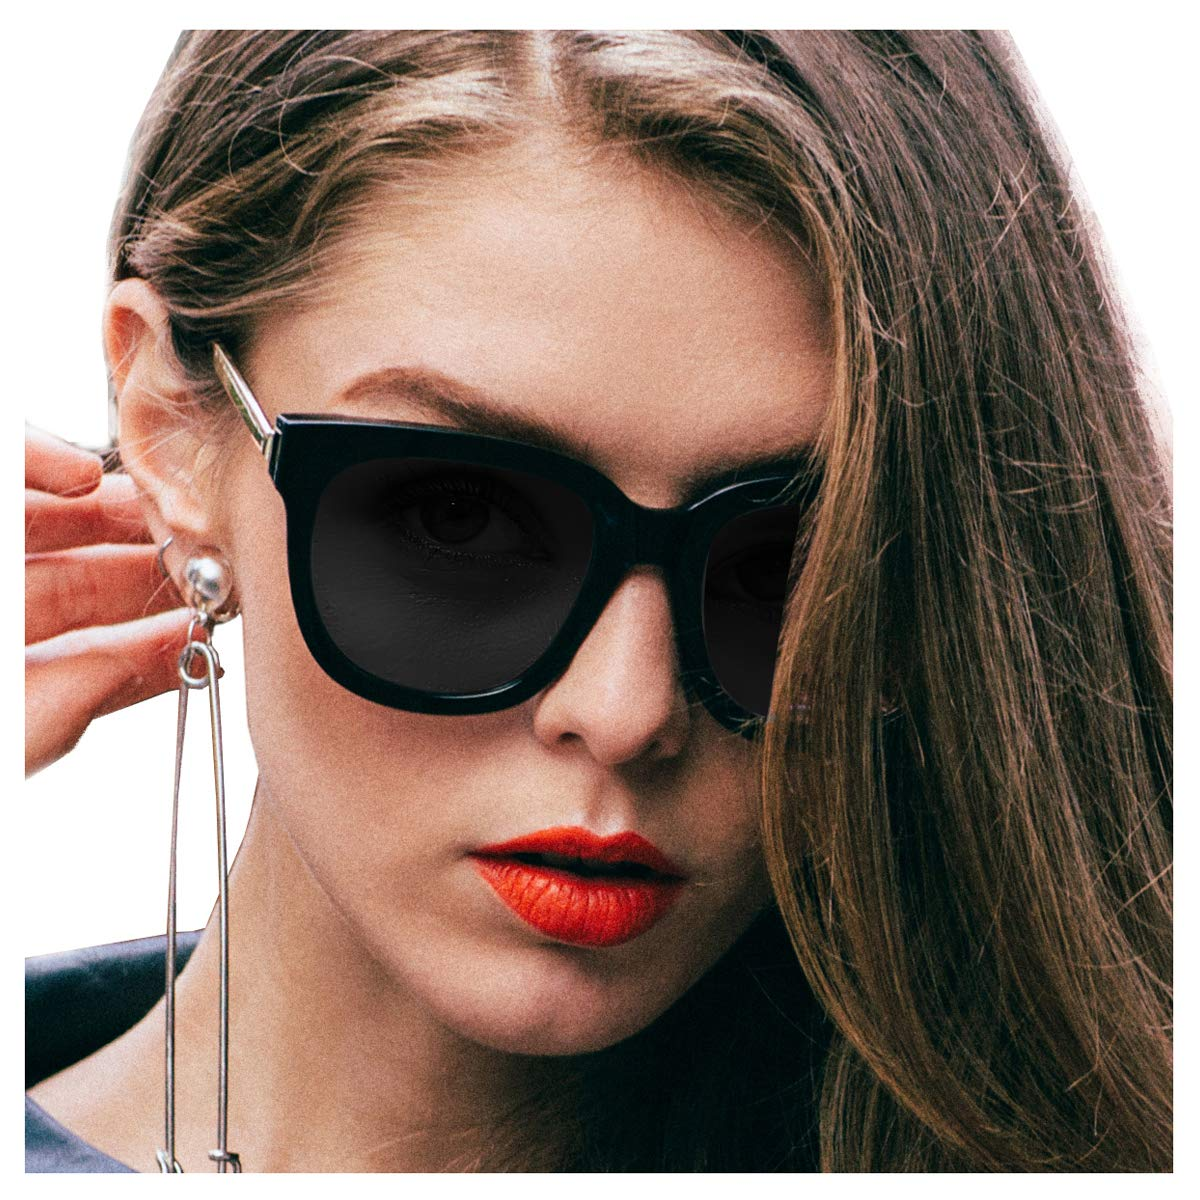 SIPHEW Sunglasses Women, Retro Oversized Frame with 100% UVA/UVB Protection, Anti Glare, Anti Reflective and Polarised Lenses